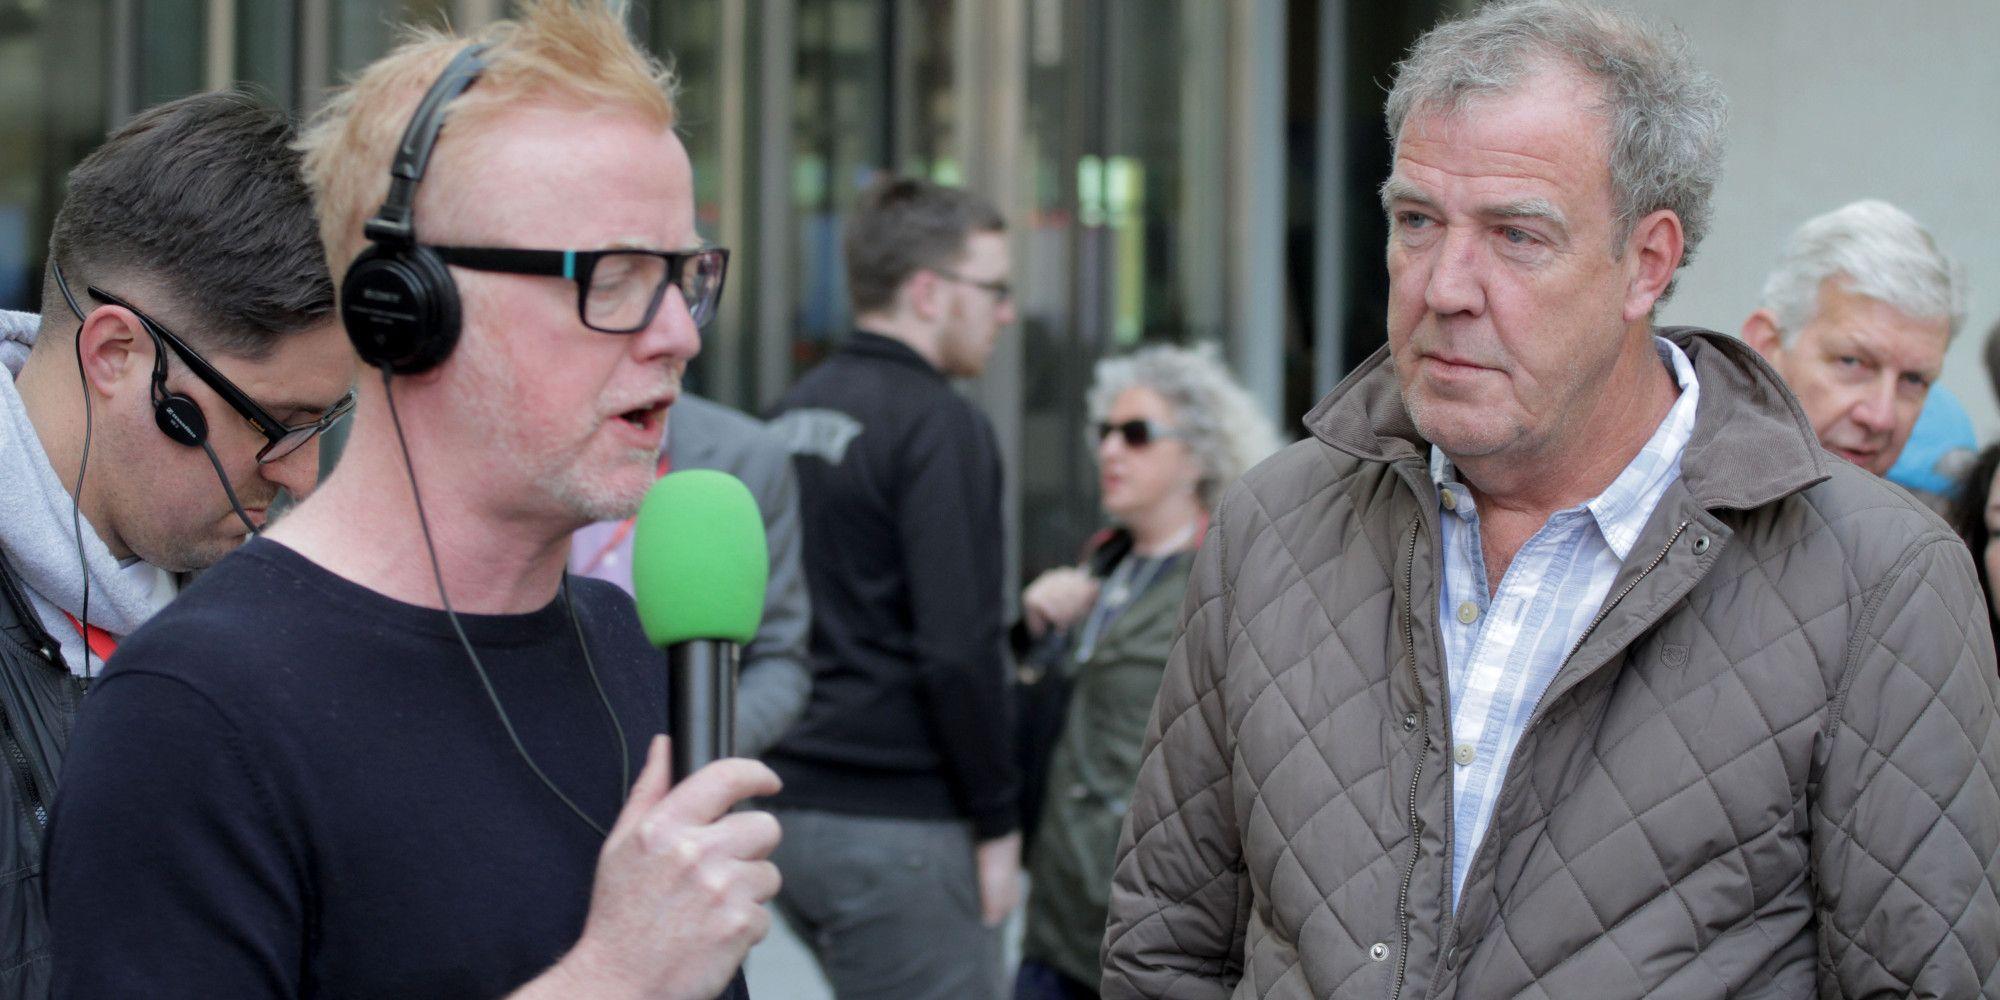 Jeremy Clarkson on Chris Evans Radio 2 show. BBC Radio studios in Central London.